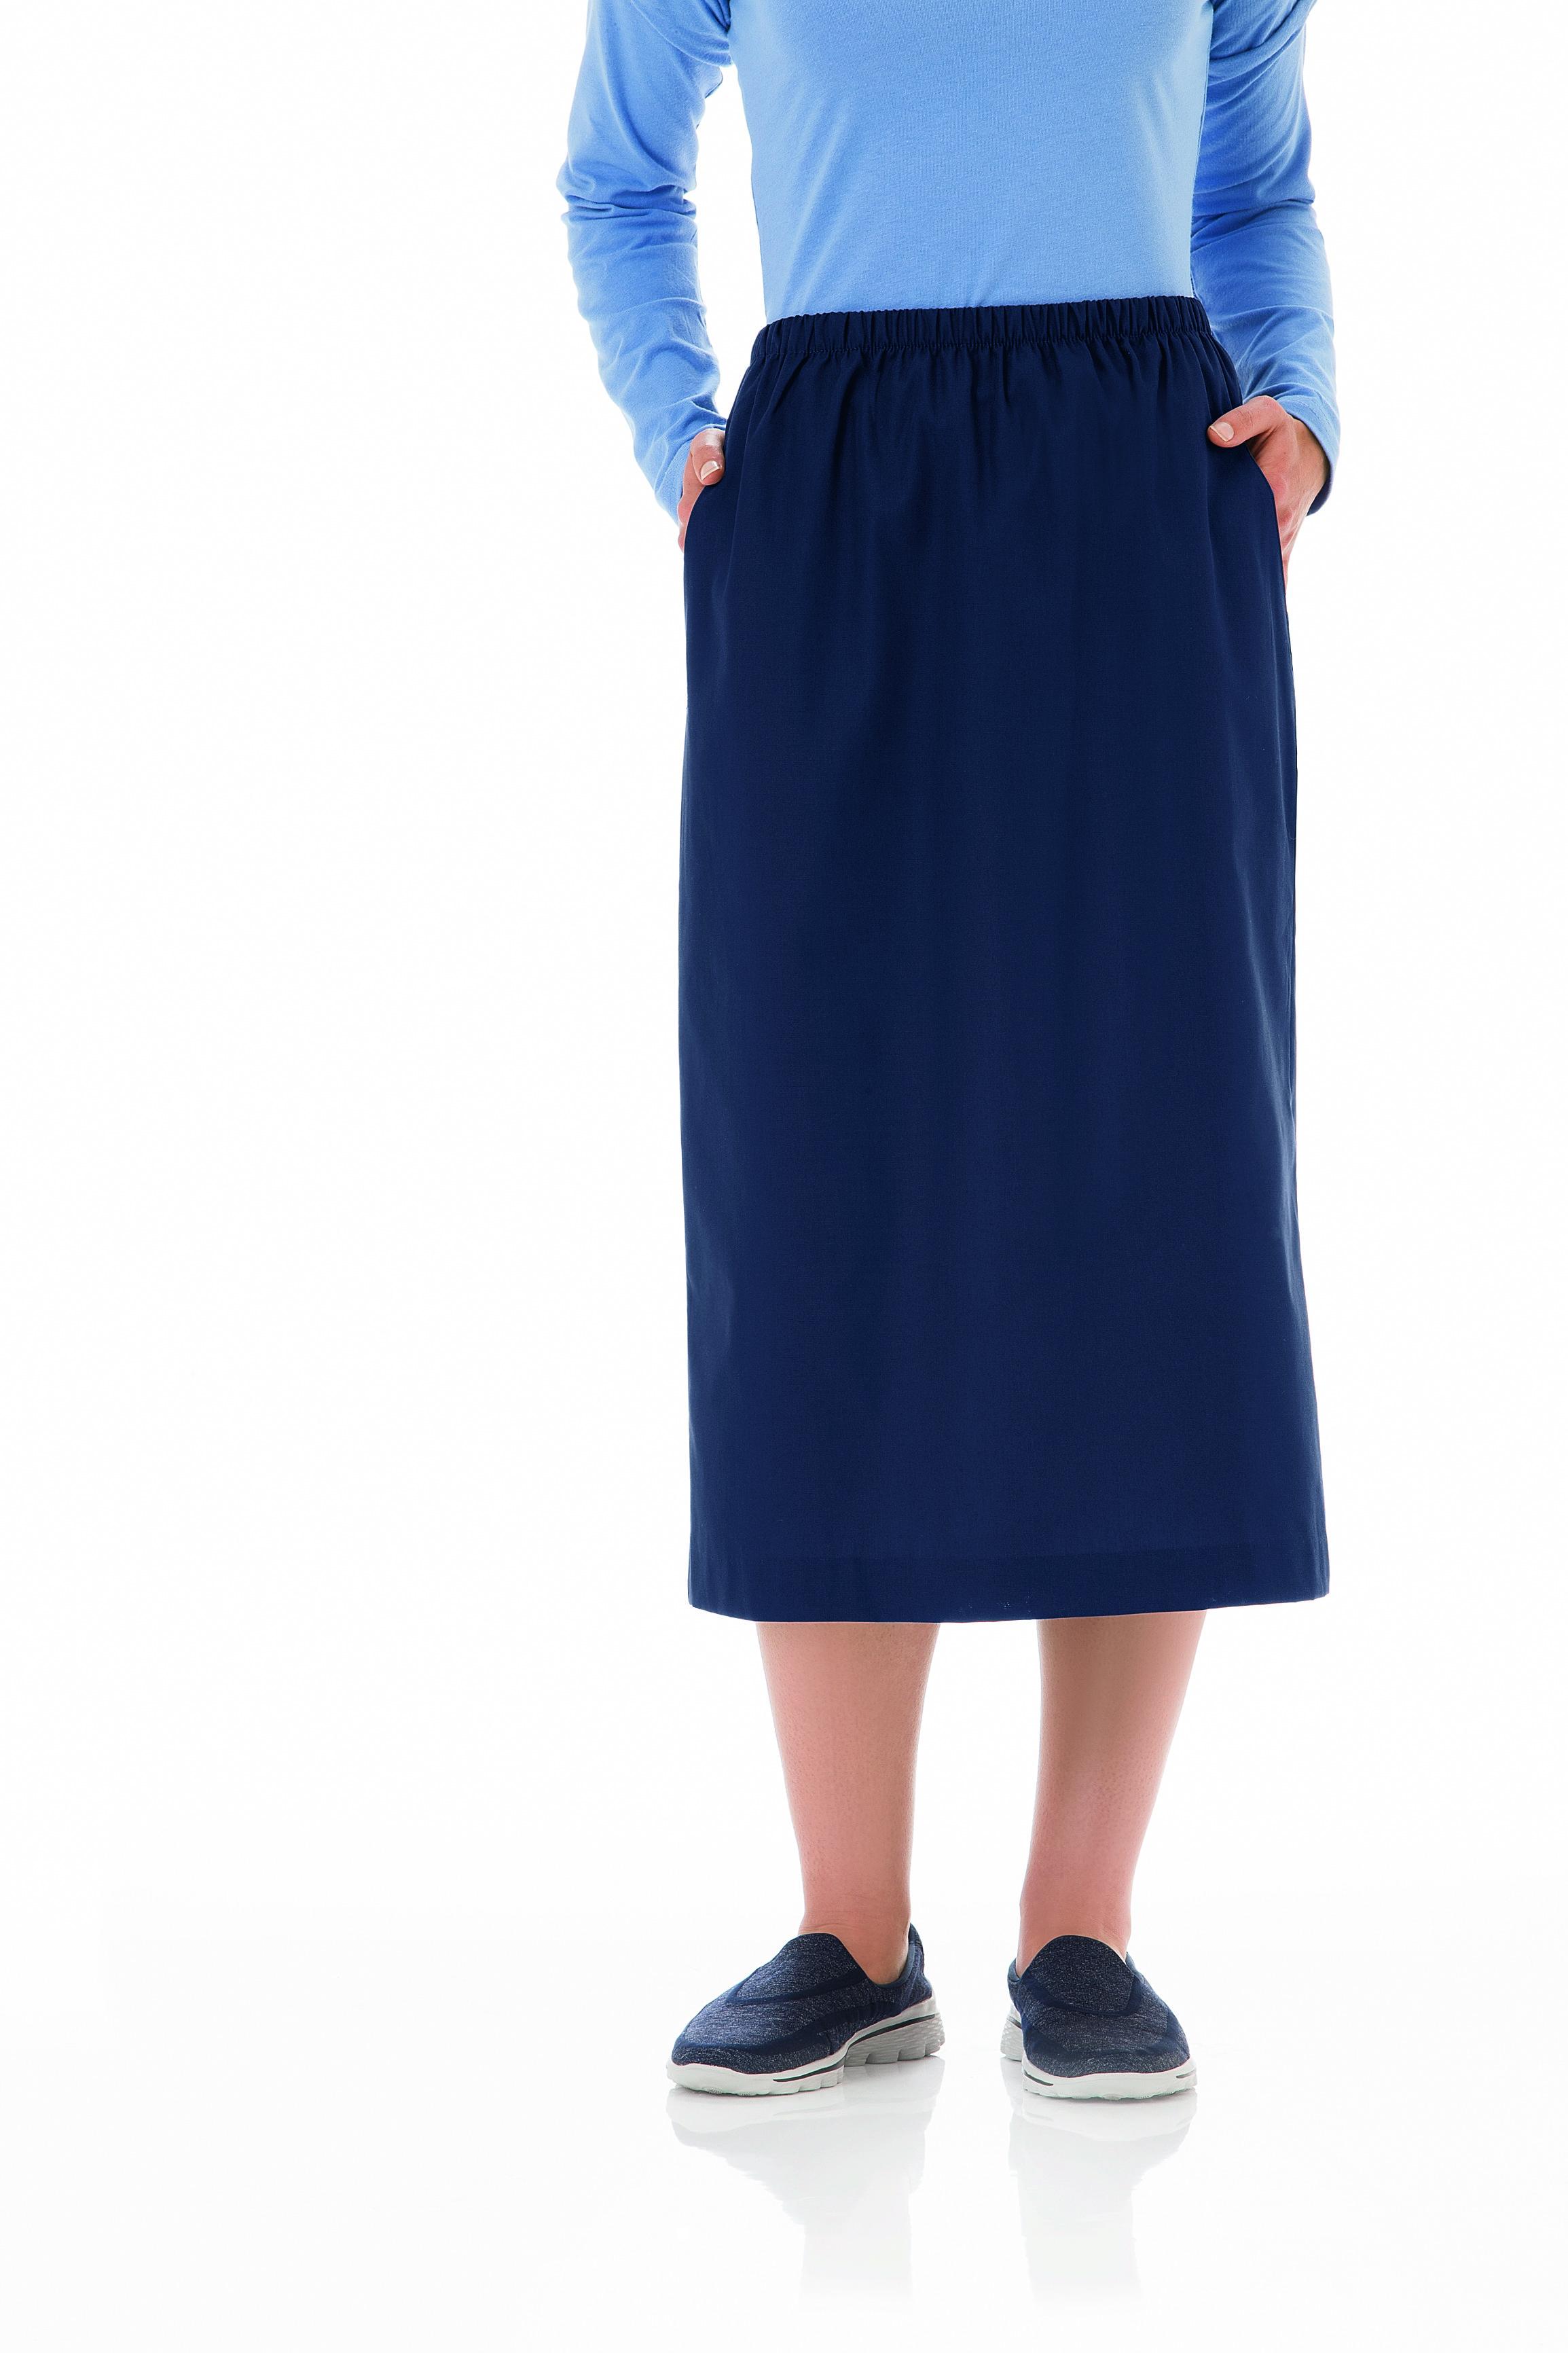 Fundamentals Ladies Elastic Waist Skirt 14231